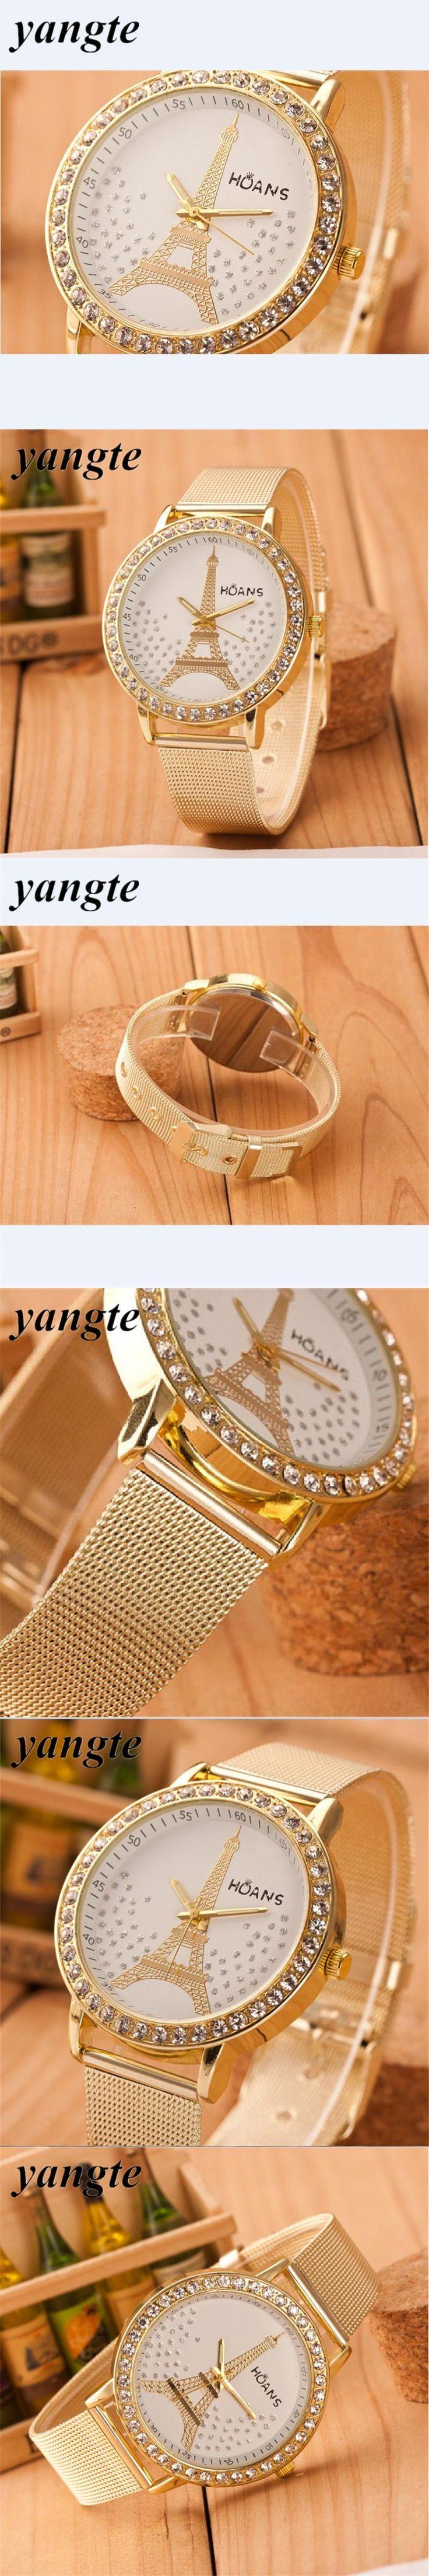 2015 Women'S Watches Brand Fashion Ladies Watch Women Wristwatches Relojes Mujer Gold Quartz Clock Relogio Feminino 2017 AB532